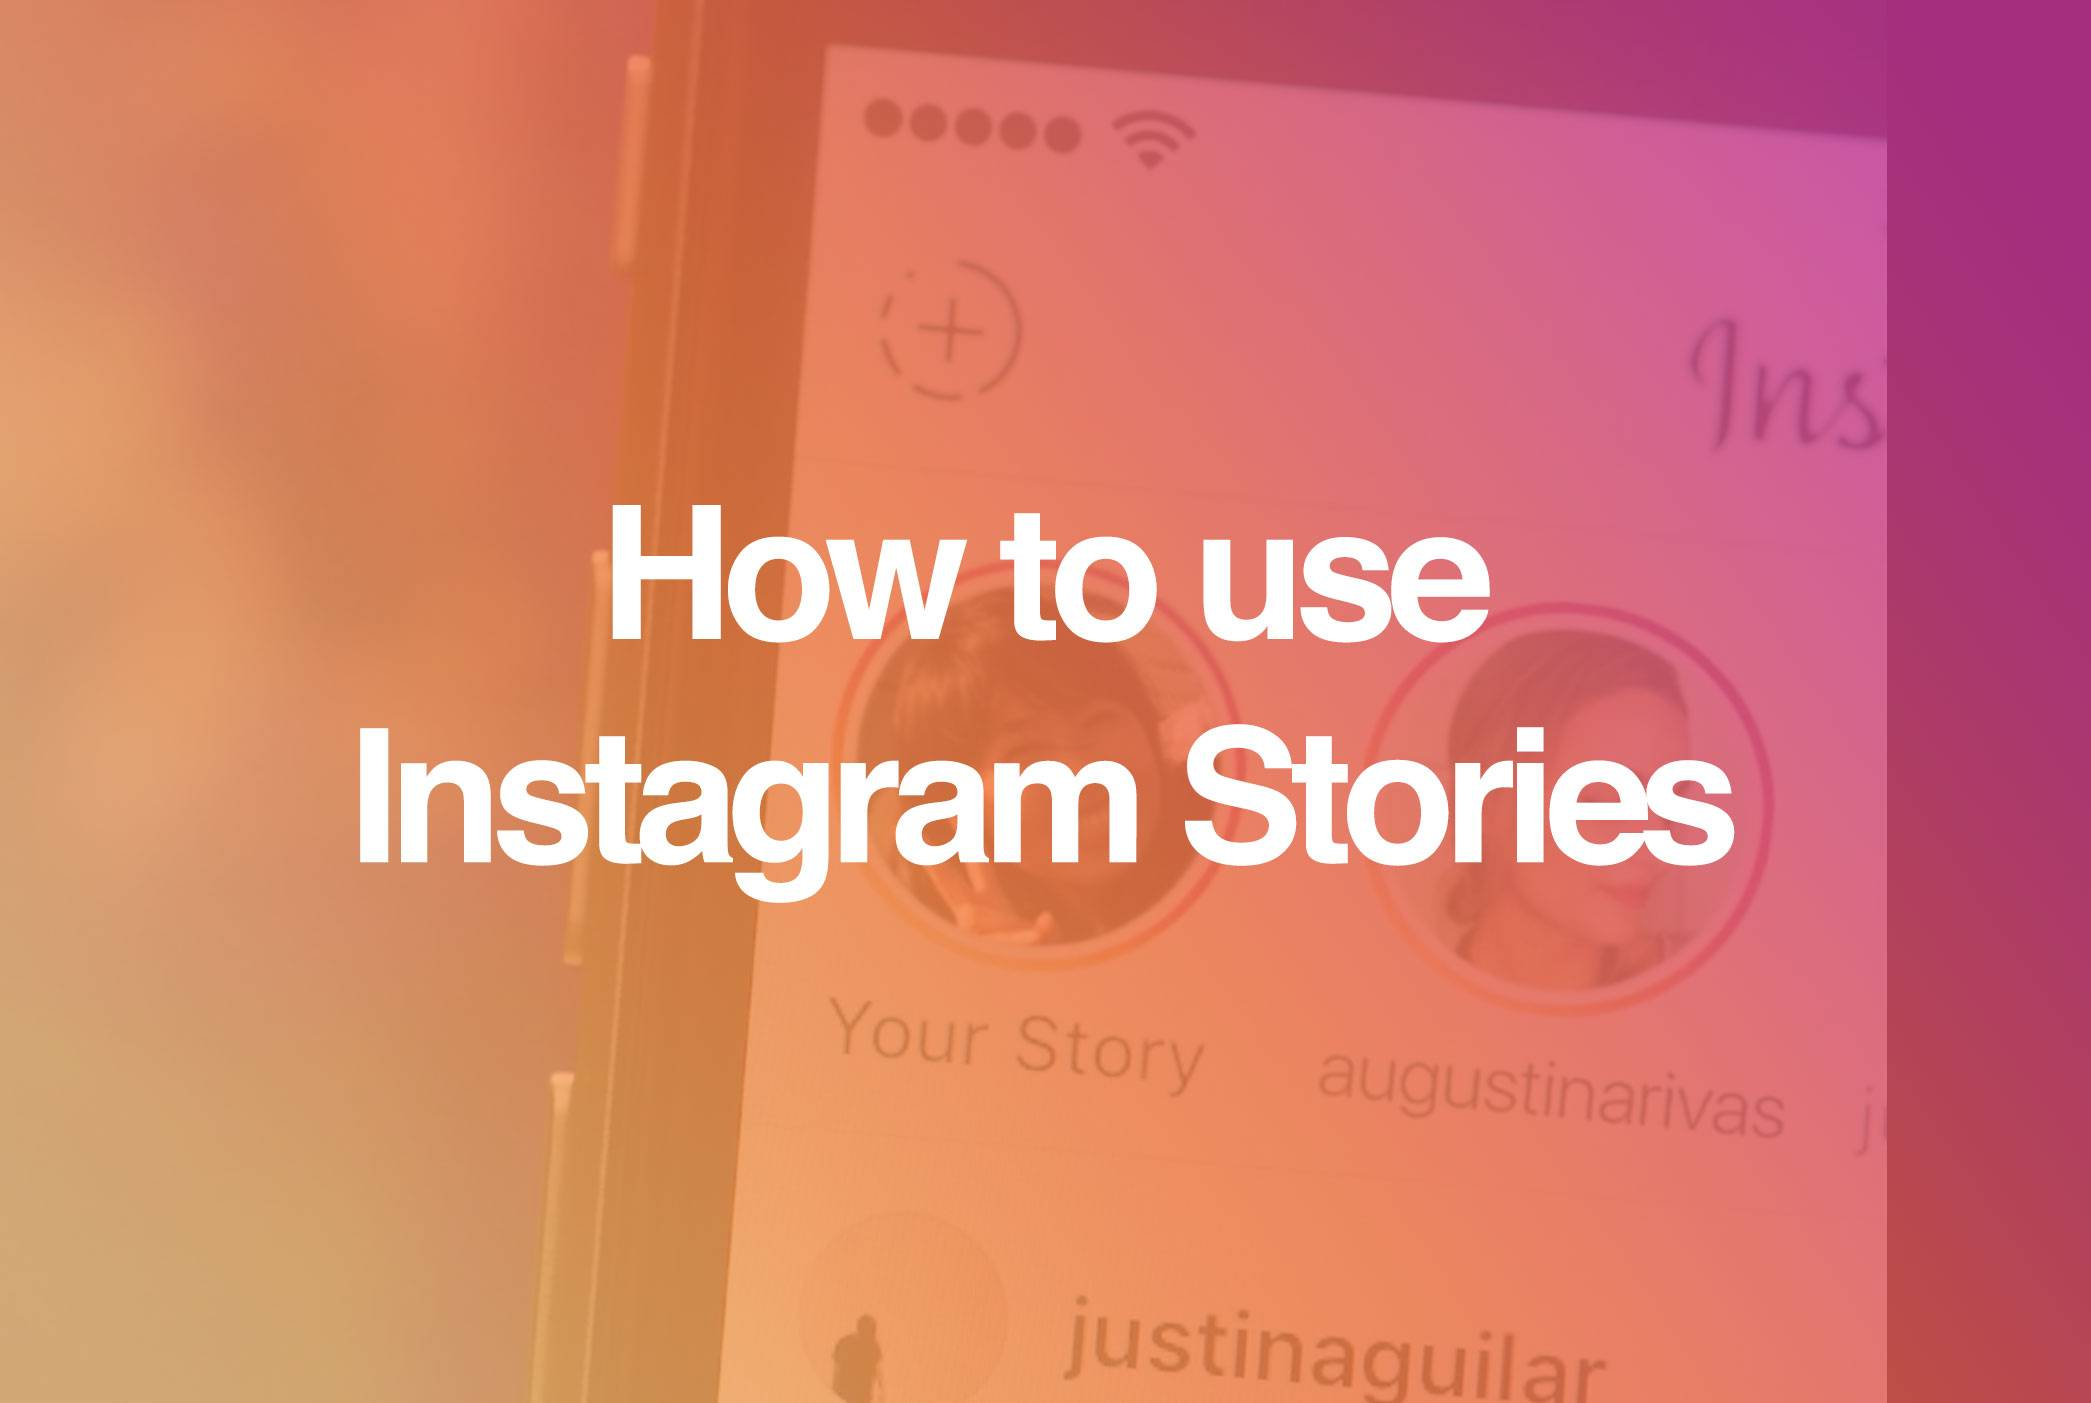 Send Snapchat Stories Instagramstoriesstopsharingg  Howtousesnapchatmemoriesdownloaddeletebackup